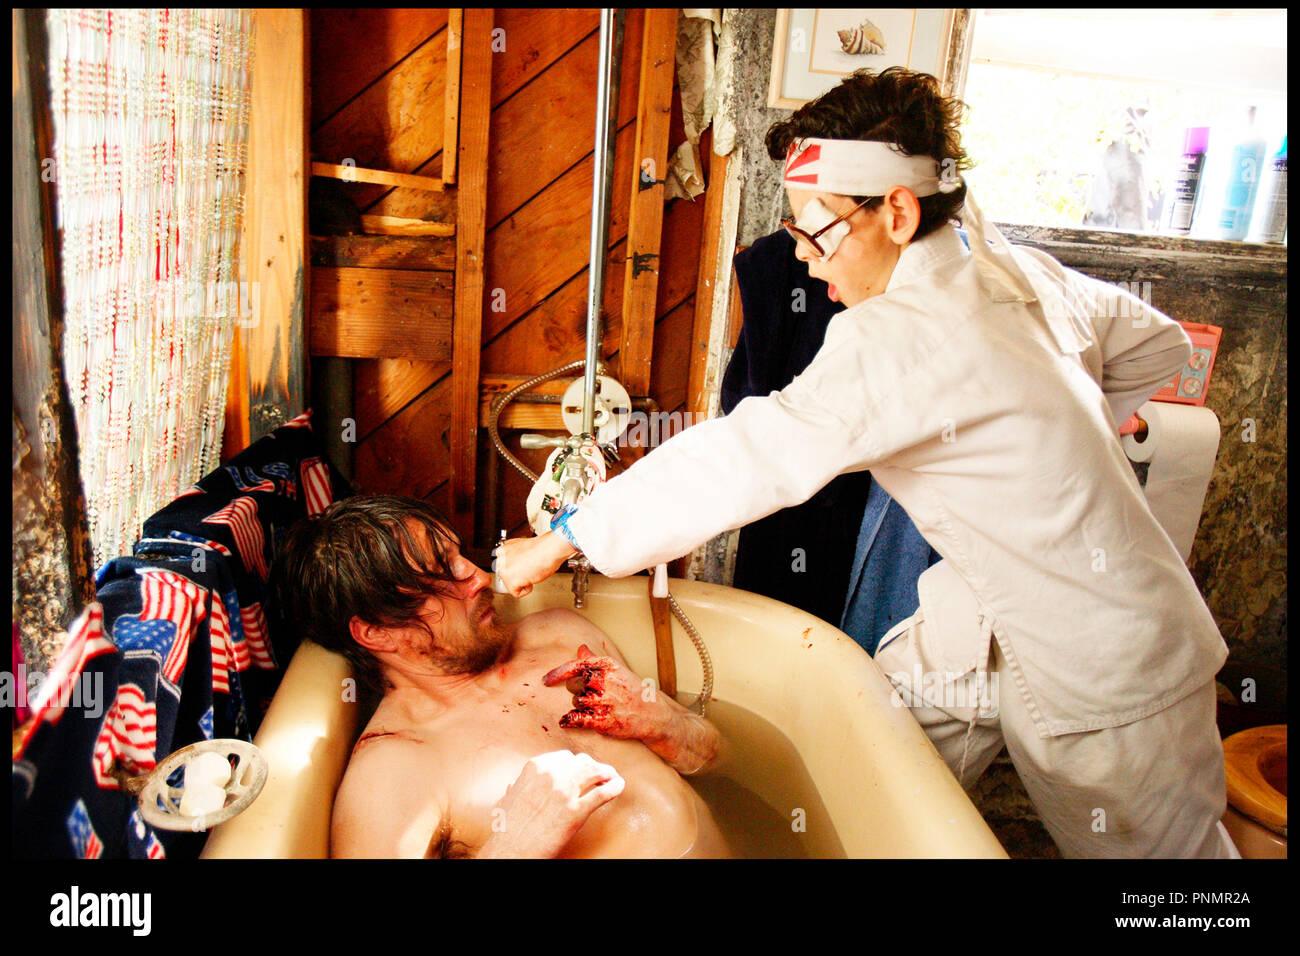 Prod DB ©Working Title - Universal / DR MI$E A PRIX (SMOKIN' ACES) de Joe Carnahan 2007 USA / GB / FRA  avec Martin Henderson et Zach Cumer - Stock Image